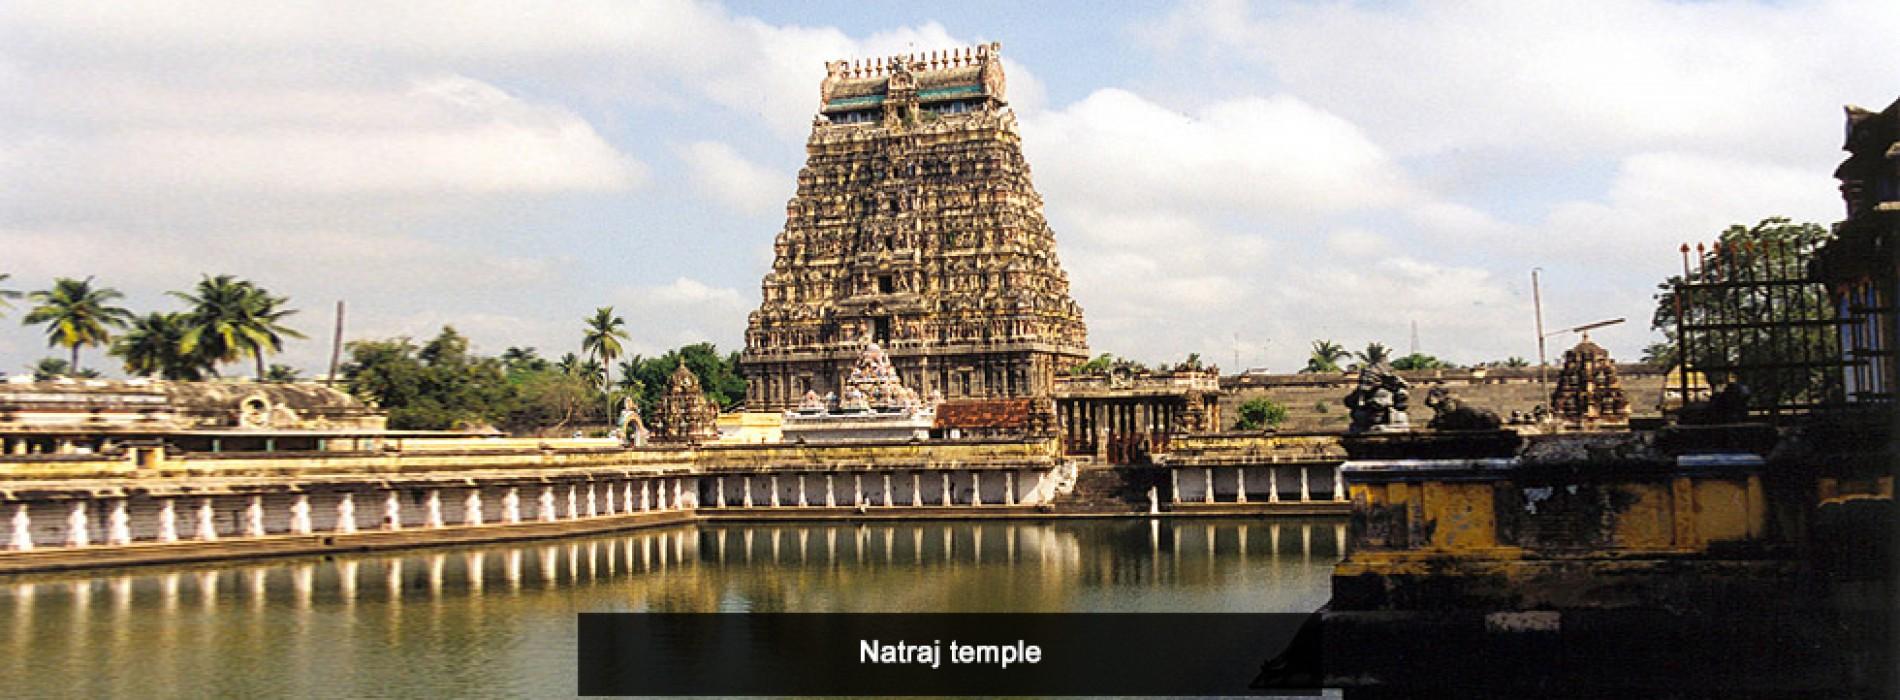 Sri Lankan Tamil pilgrims can travel to Chidambaram on ferry